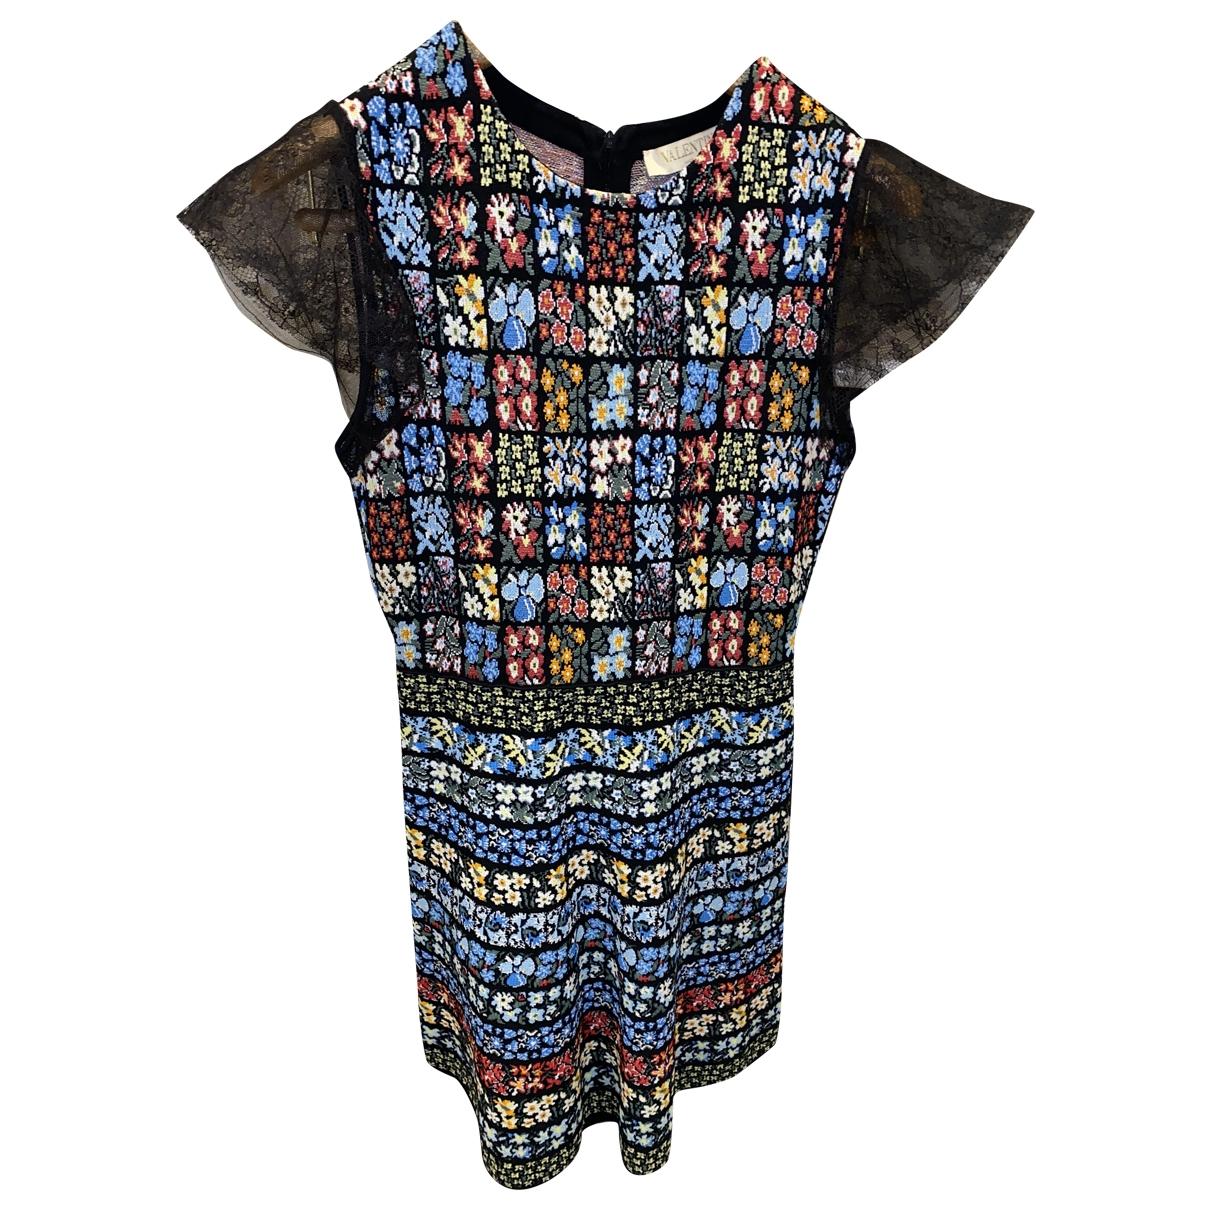 Valentino Garavani \N Multicolour dress for Women M International